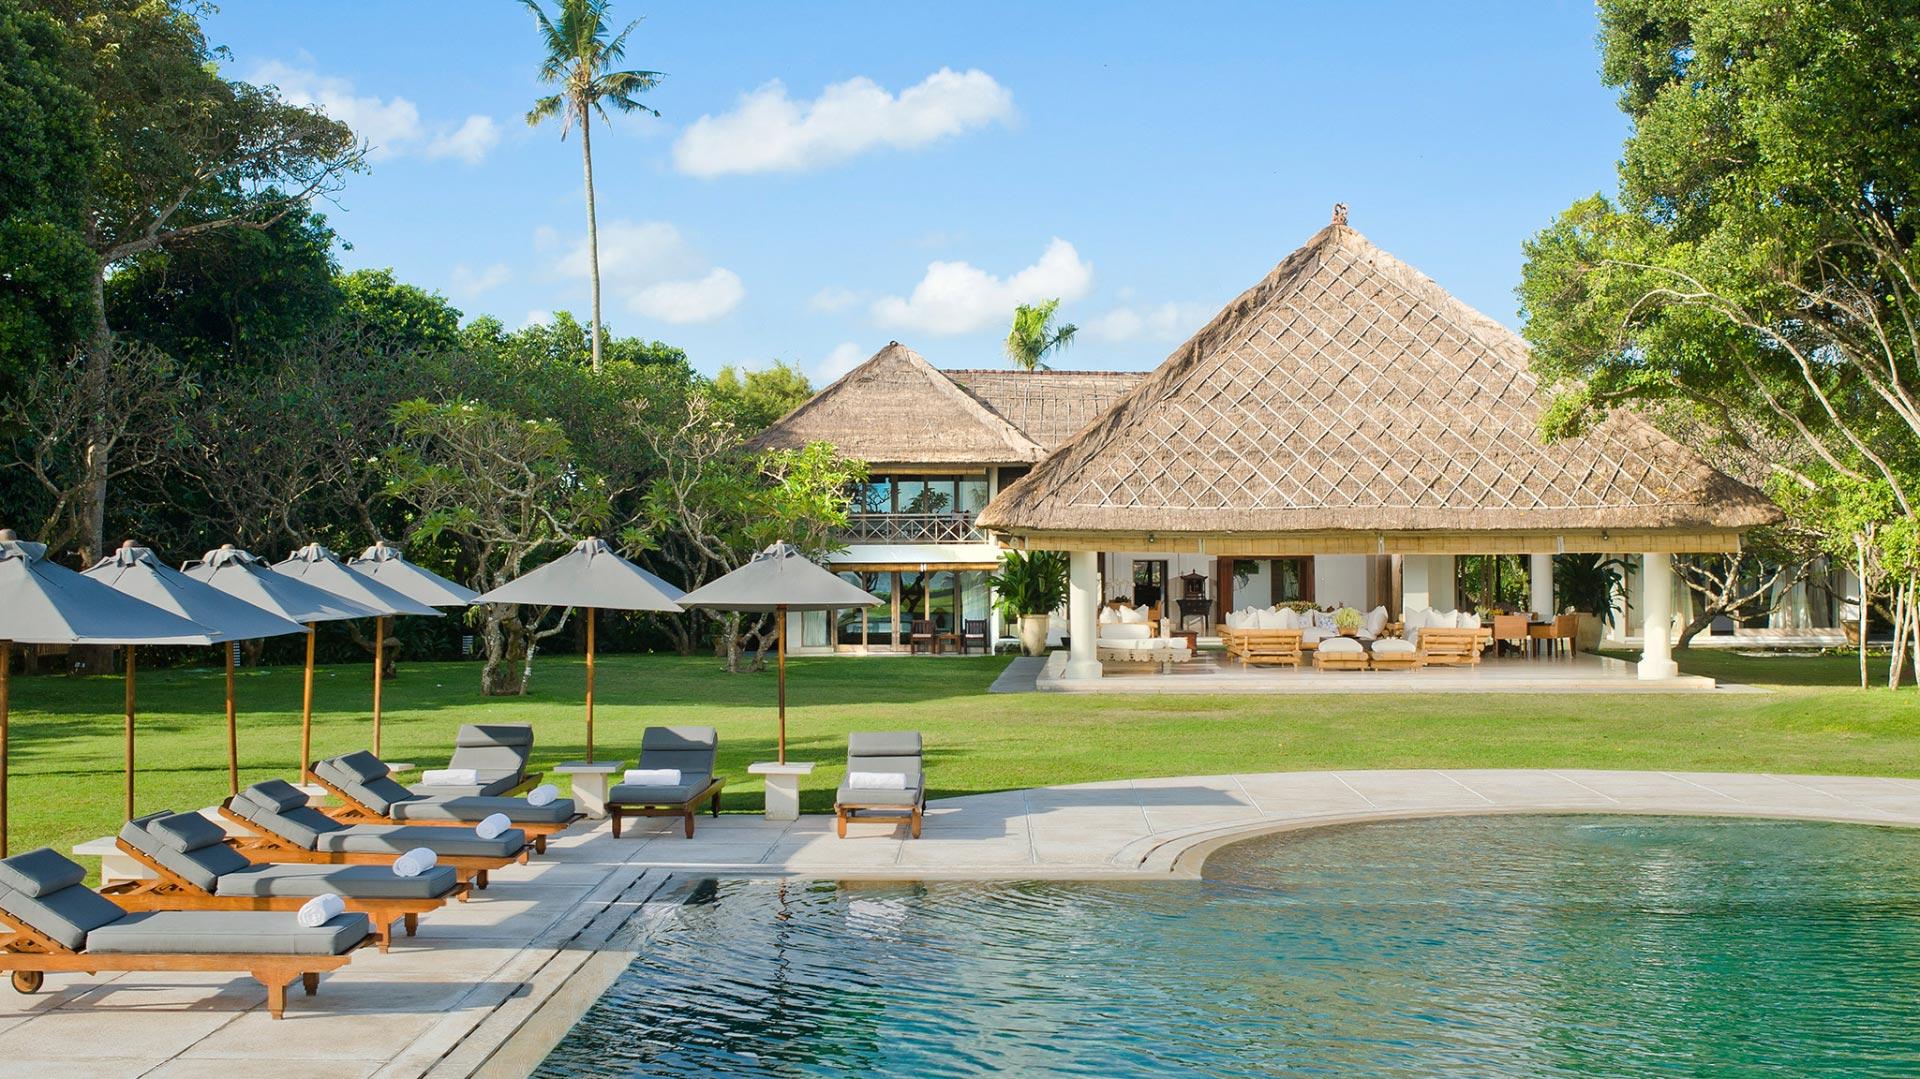 Villa Atas Ombak - Bali Beachfront Villas